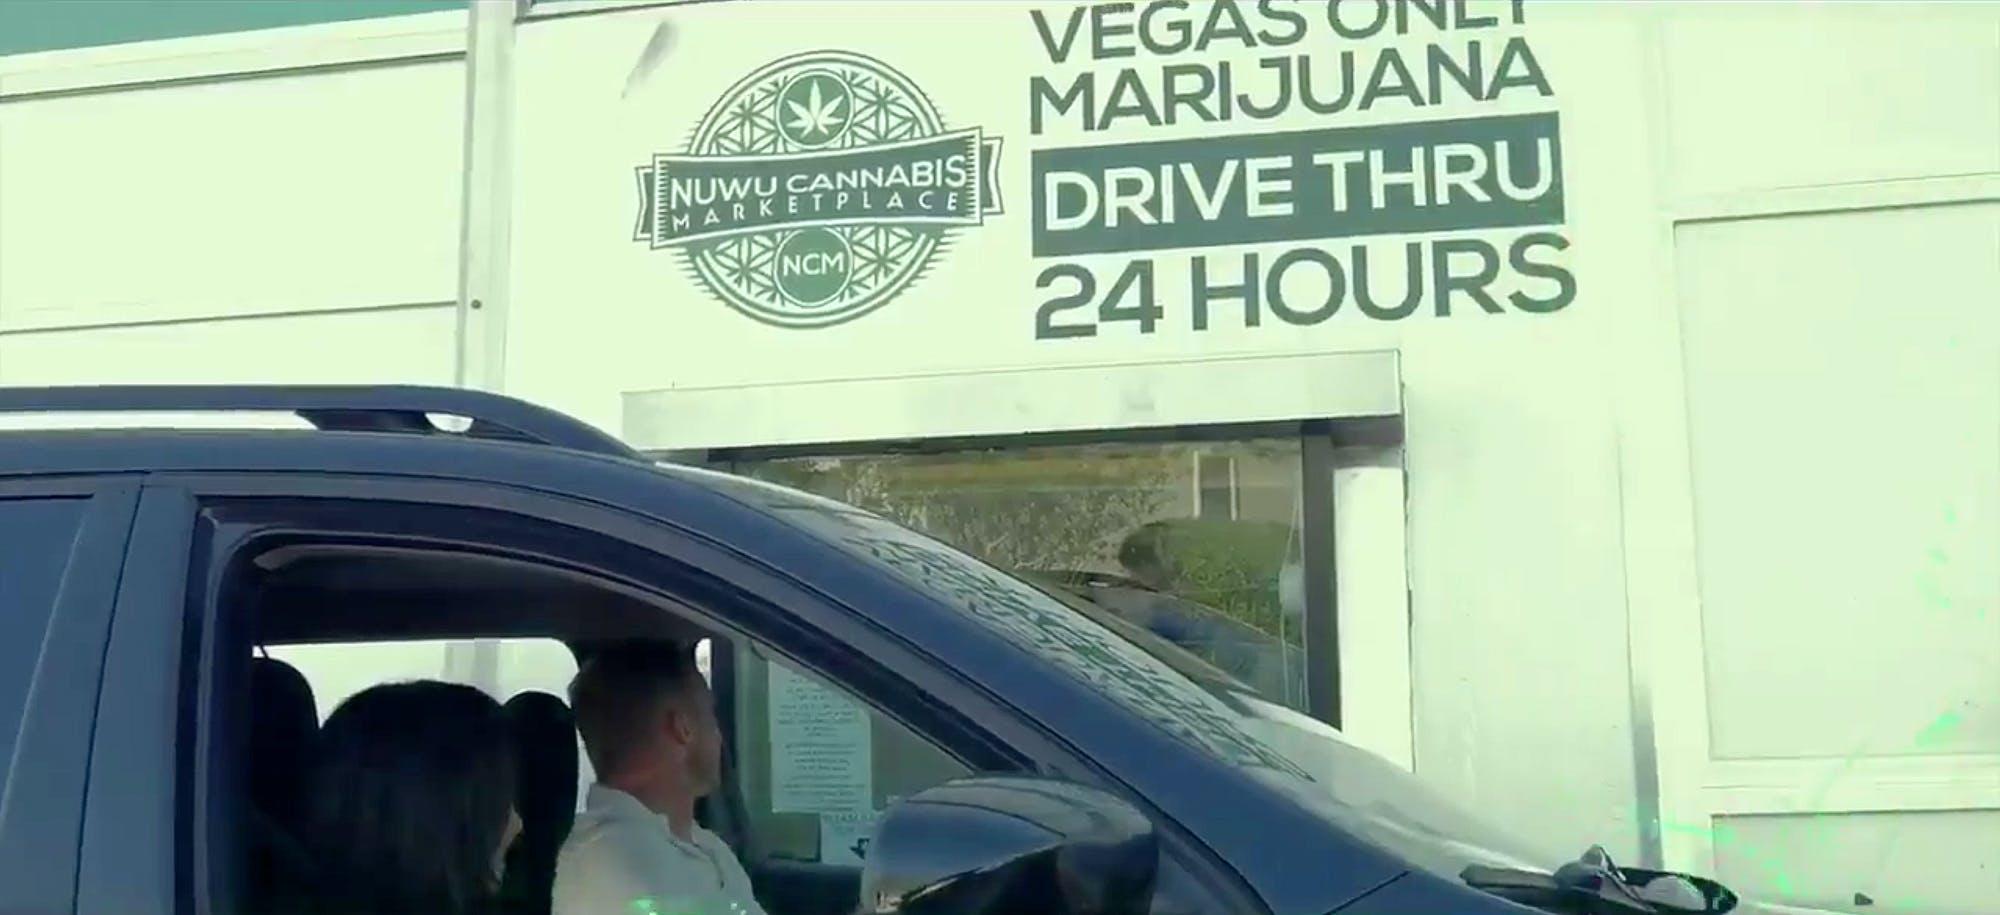 lasvegaslights Its Official: Michigan is set to vote on recreational marijuana this fall